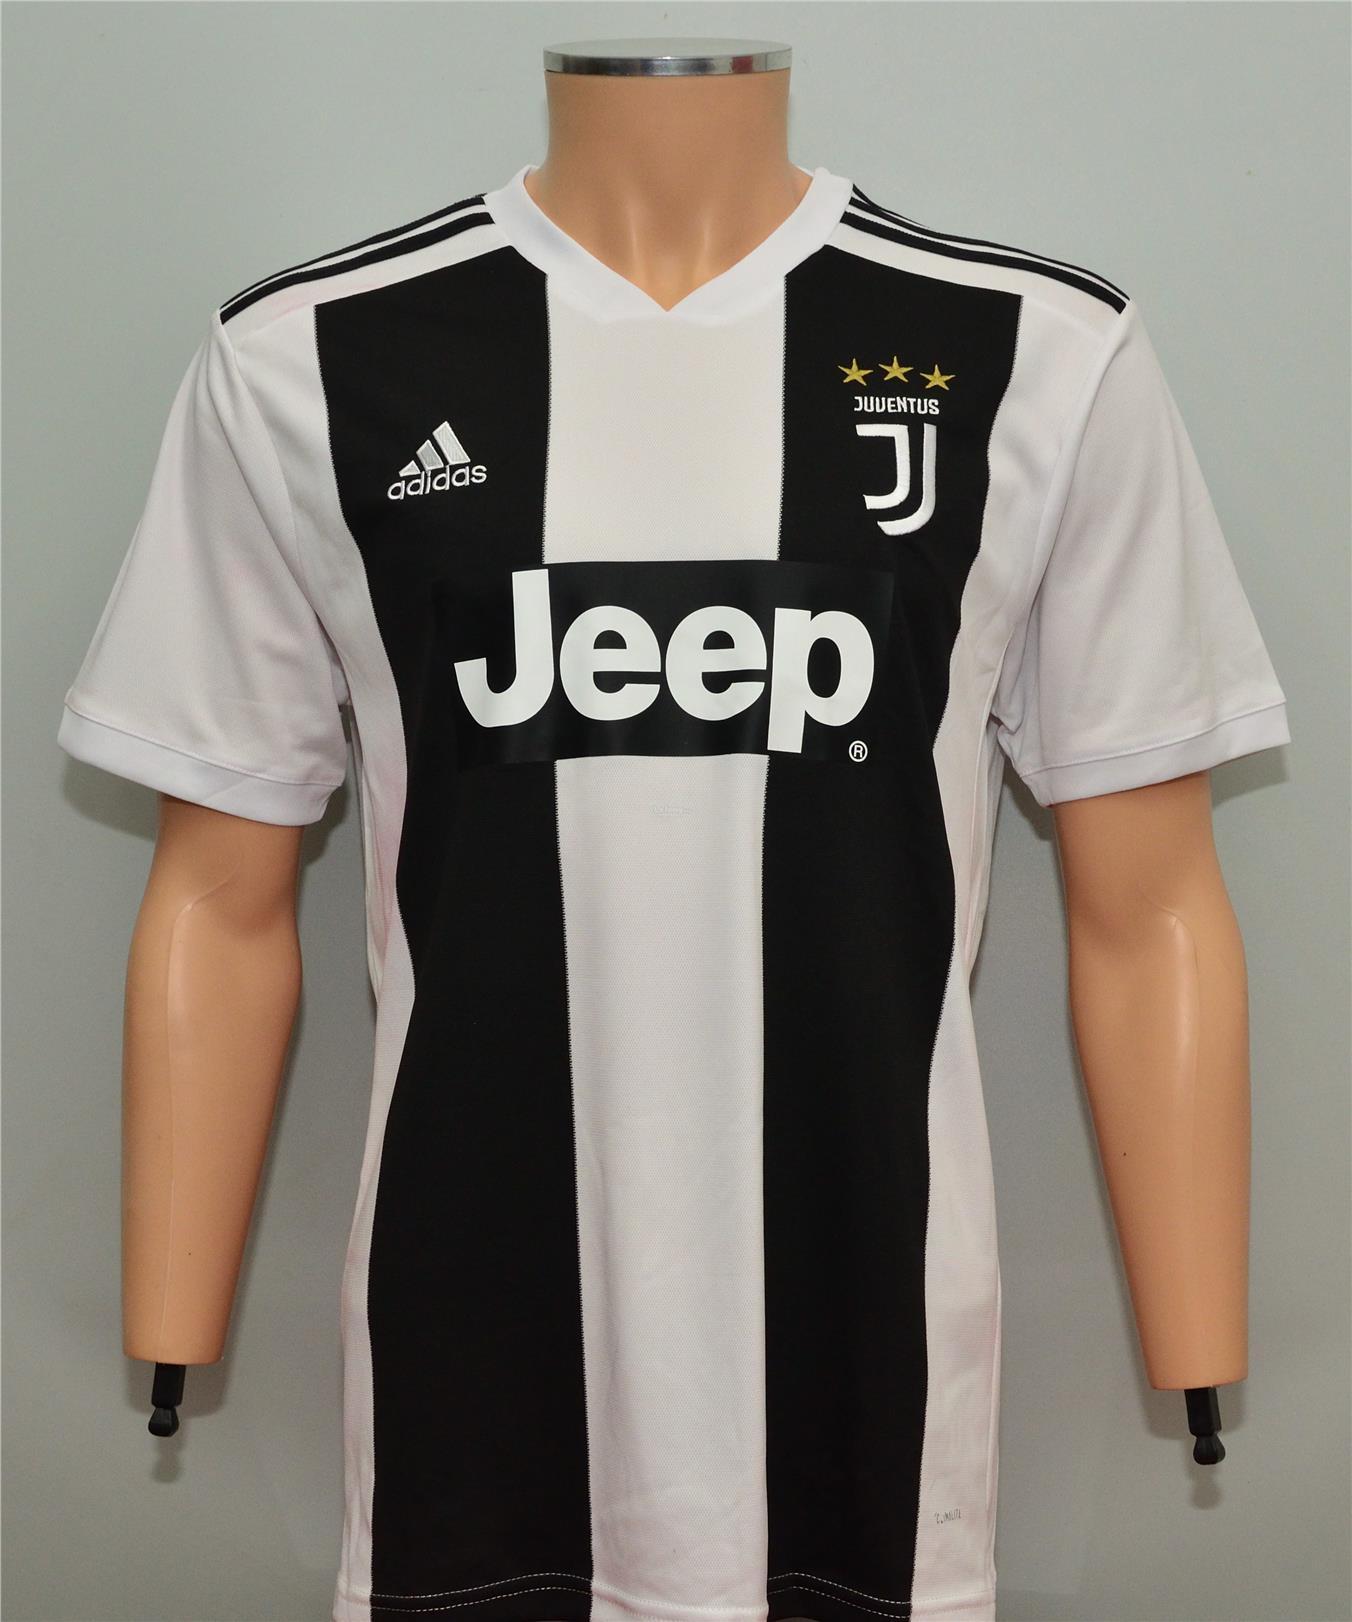 56245981d55 Juventus Home Jersey 2018 2019 (end 9 6 2019 7 15 PM)